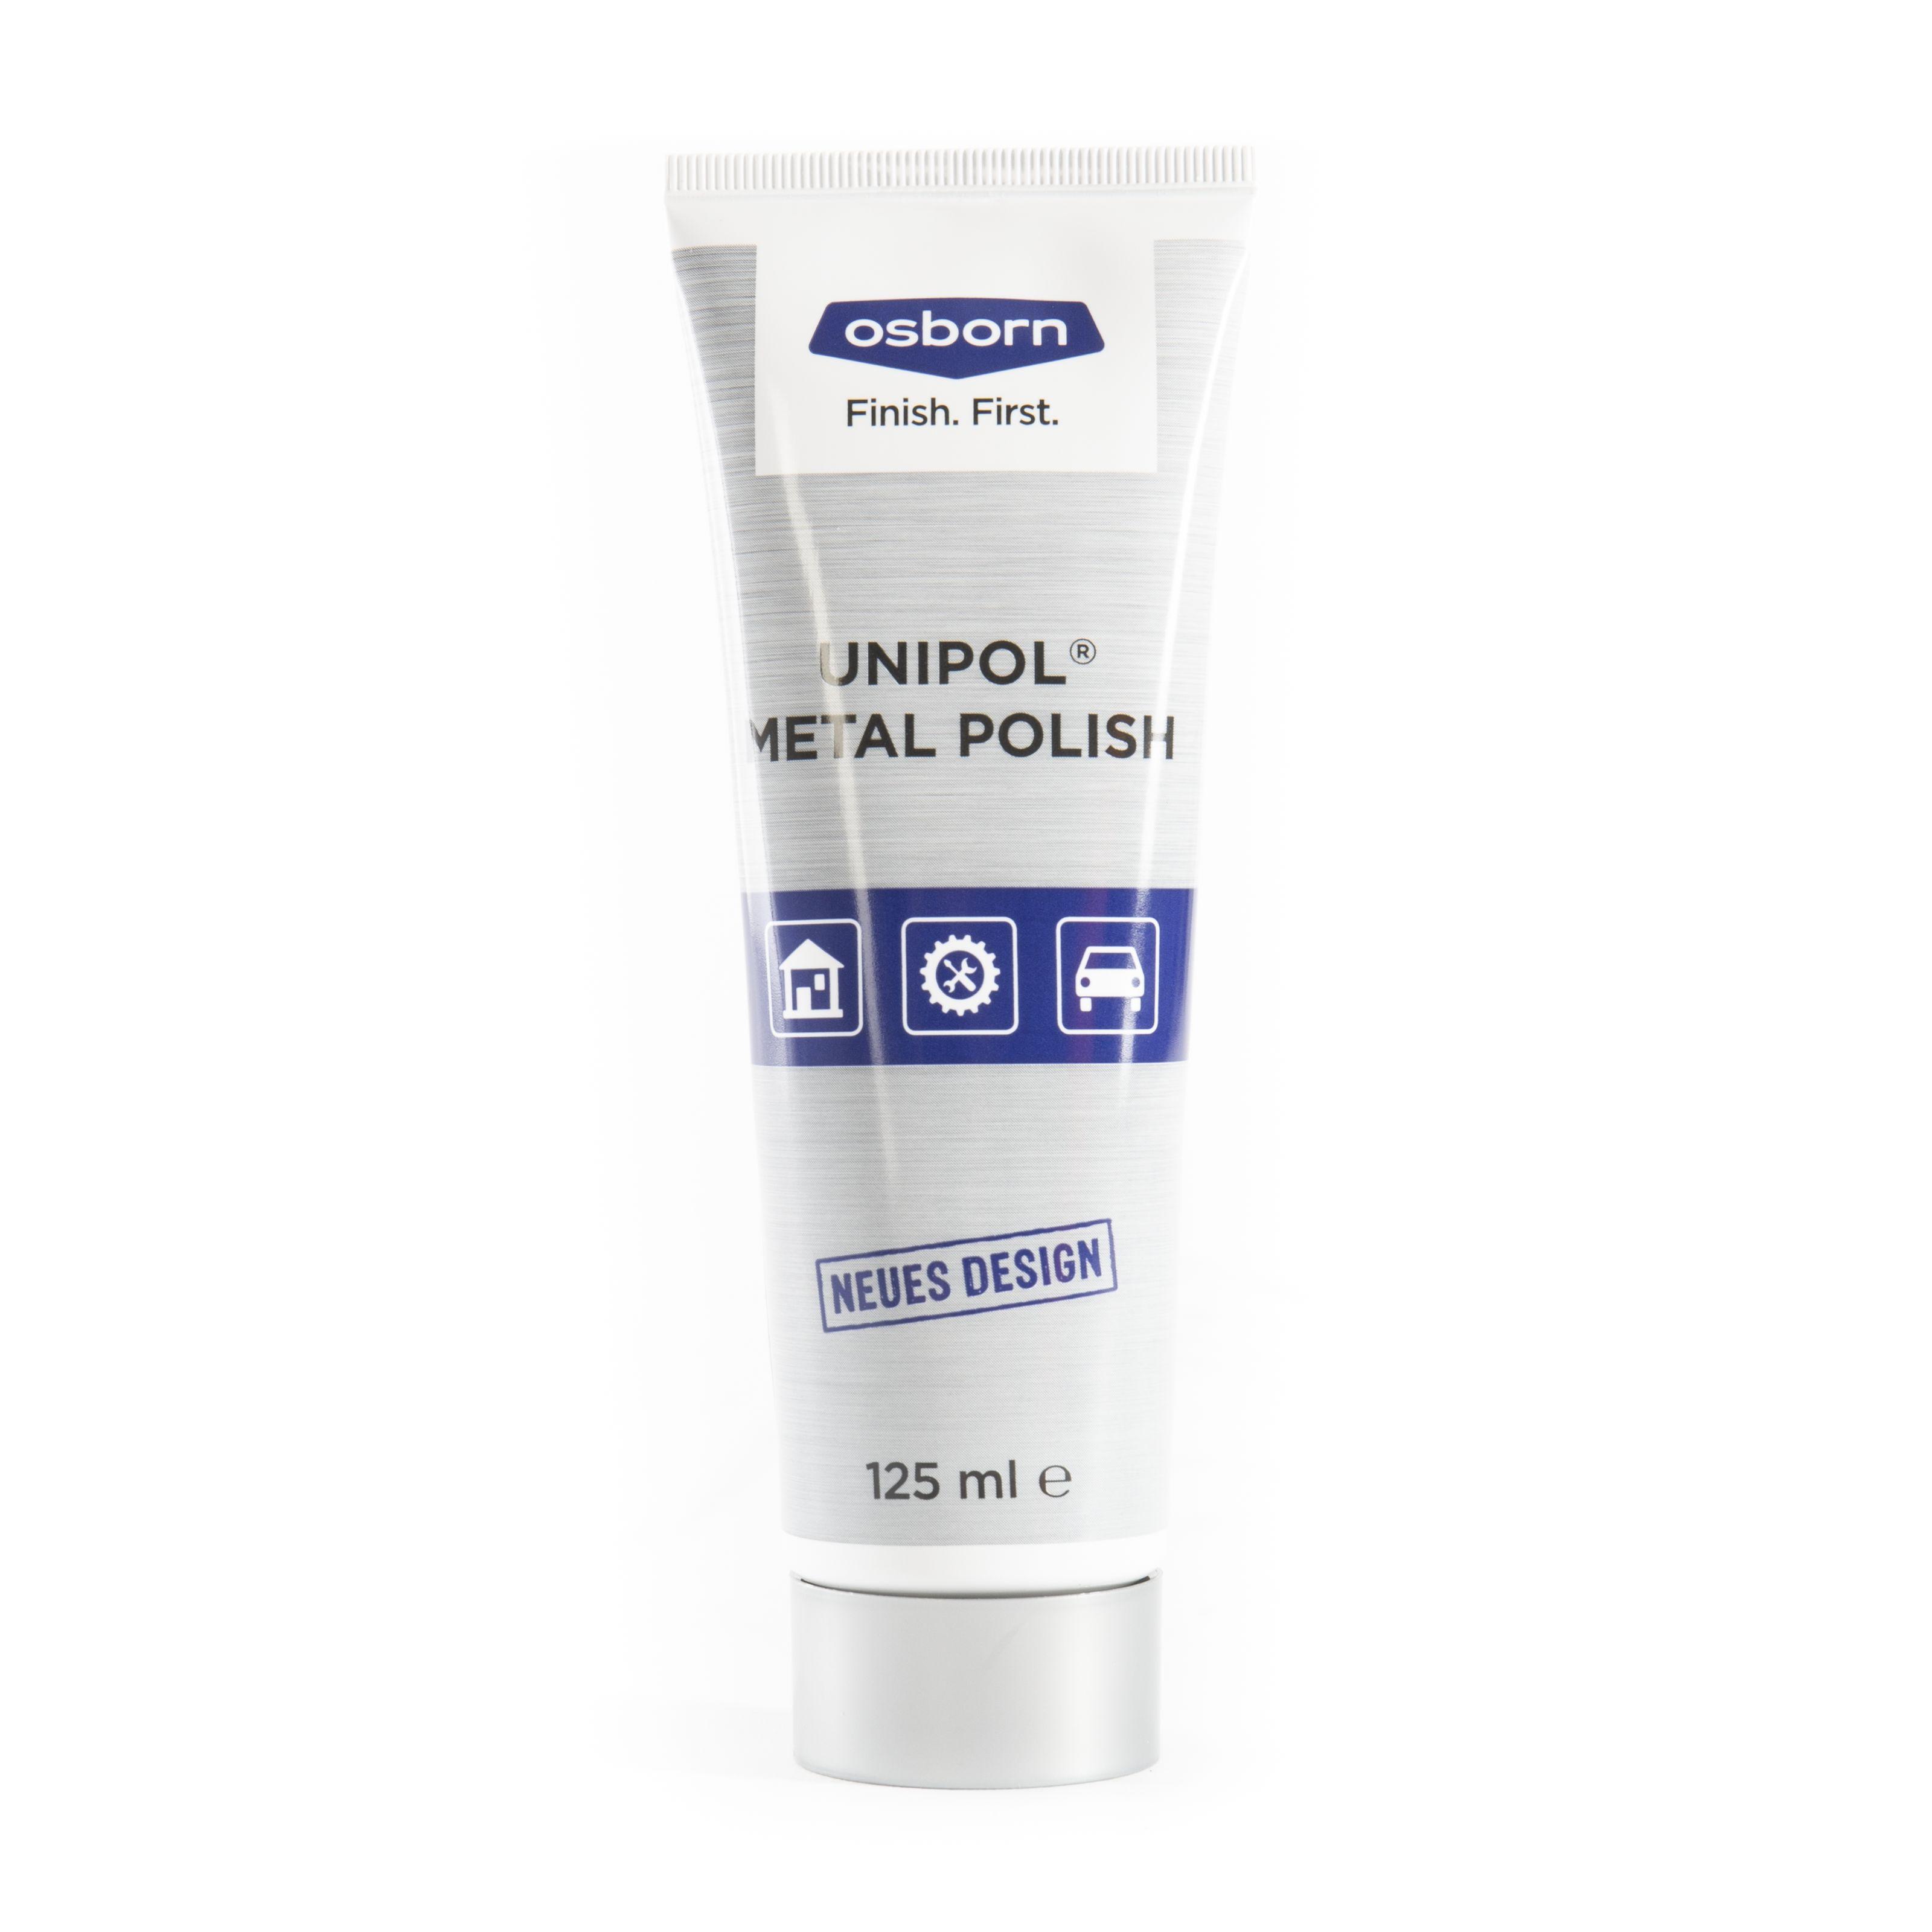 UNIPOL - Metallpolitur 125 ml 100 ml=6 Euro 760.395